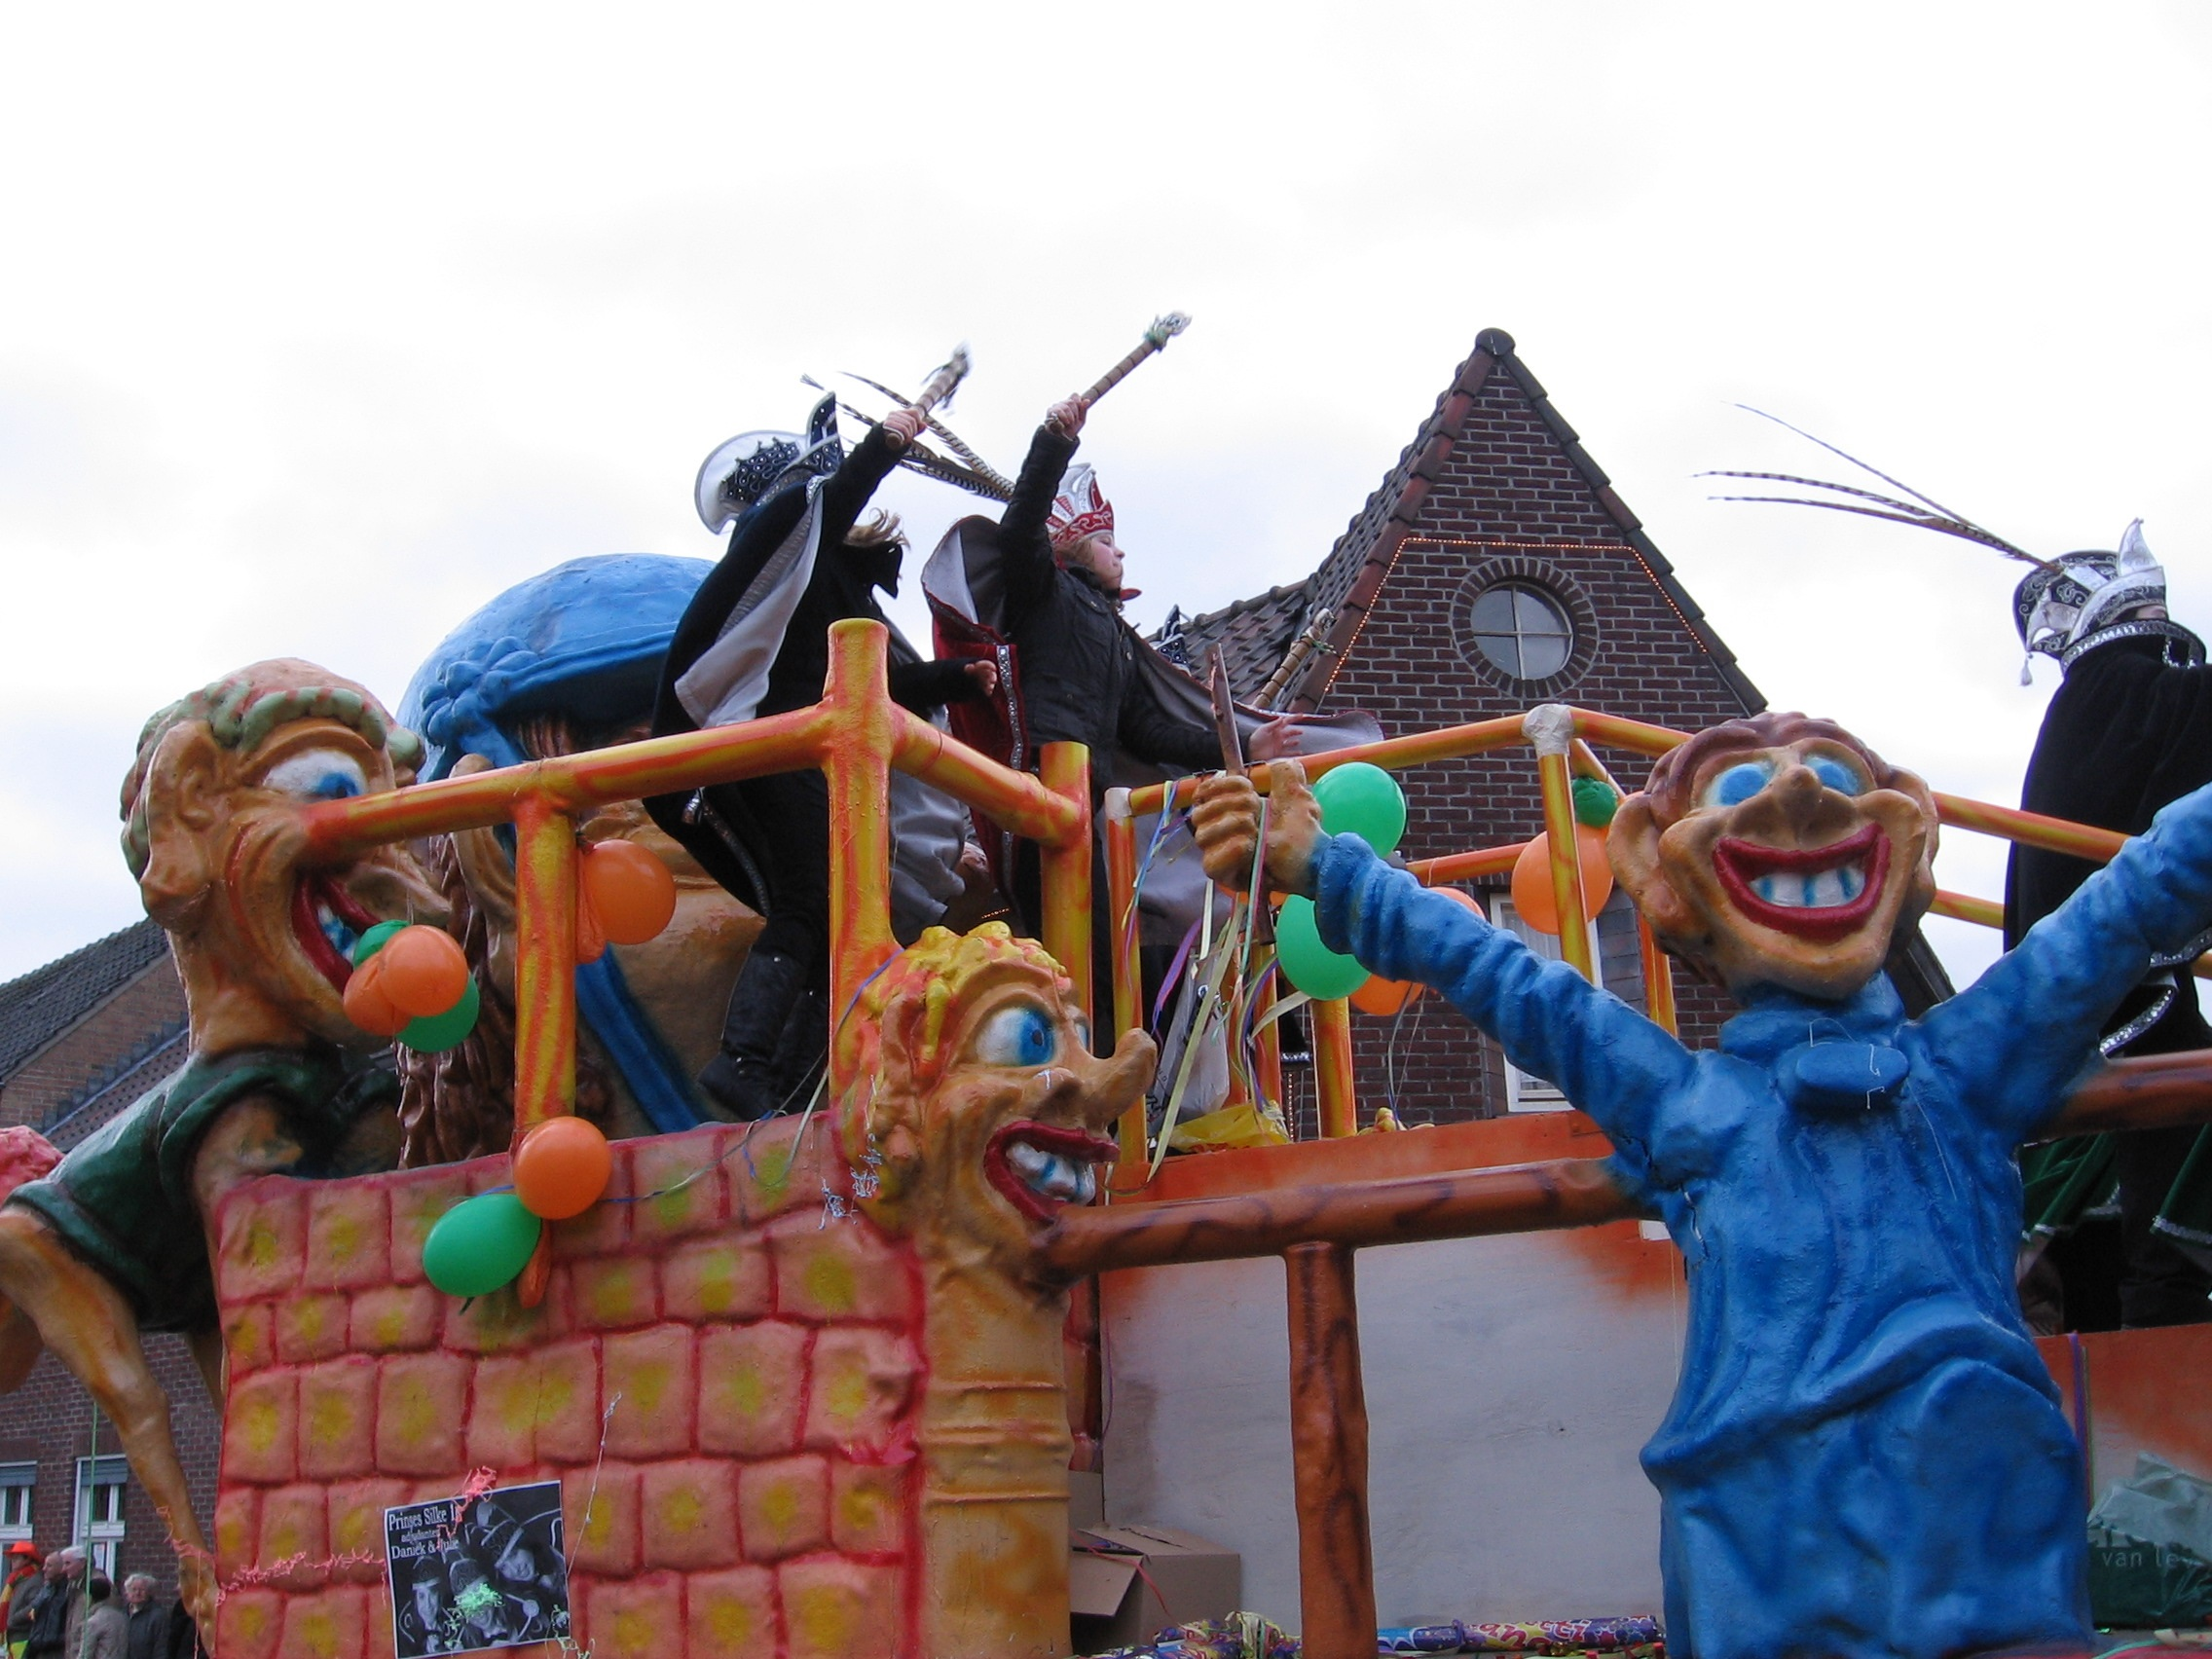 carnaval 2009 Baarlo